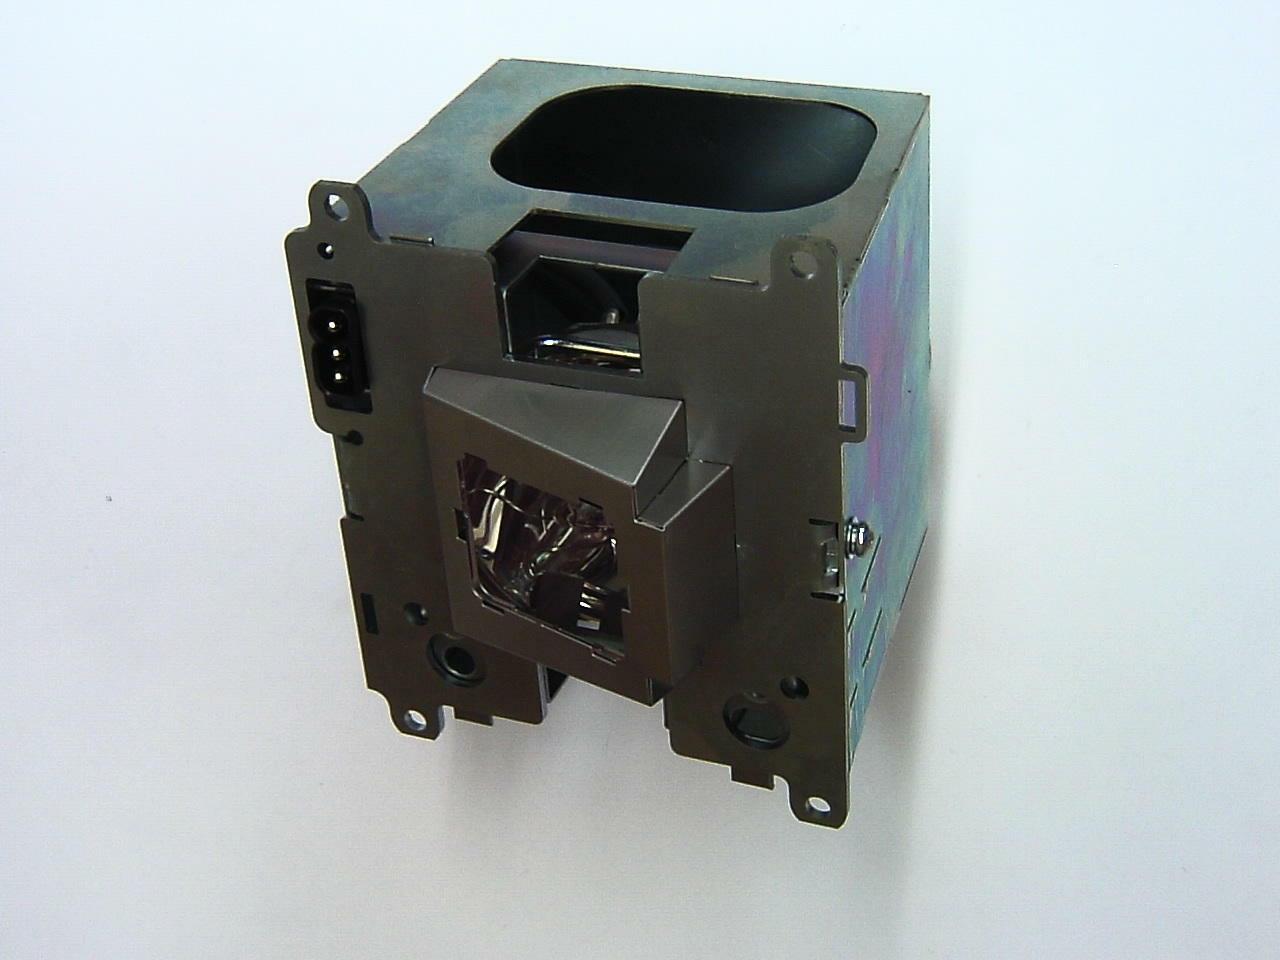 Original Simple Lámpara For DIGITAL PROJECTION TITAN 3D Proyector.